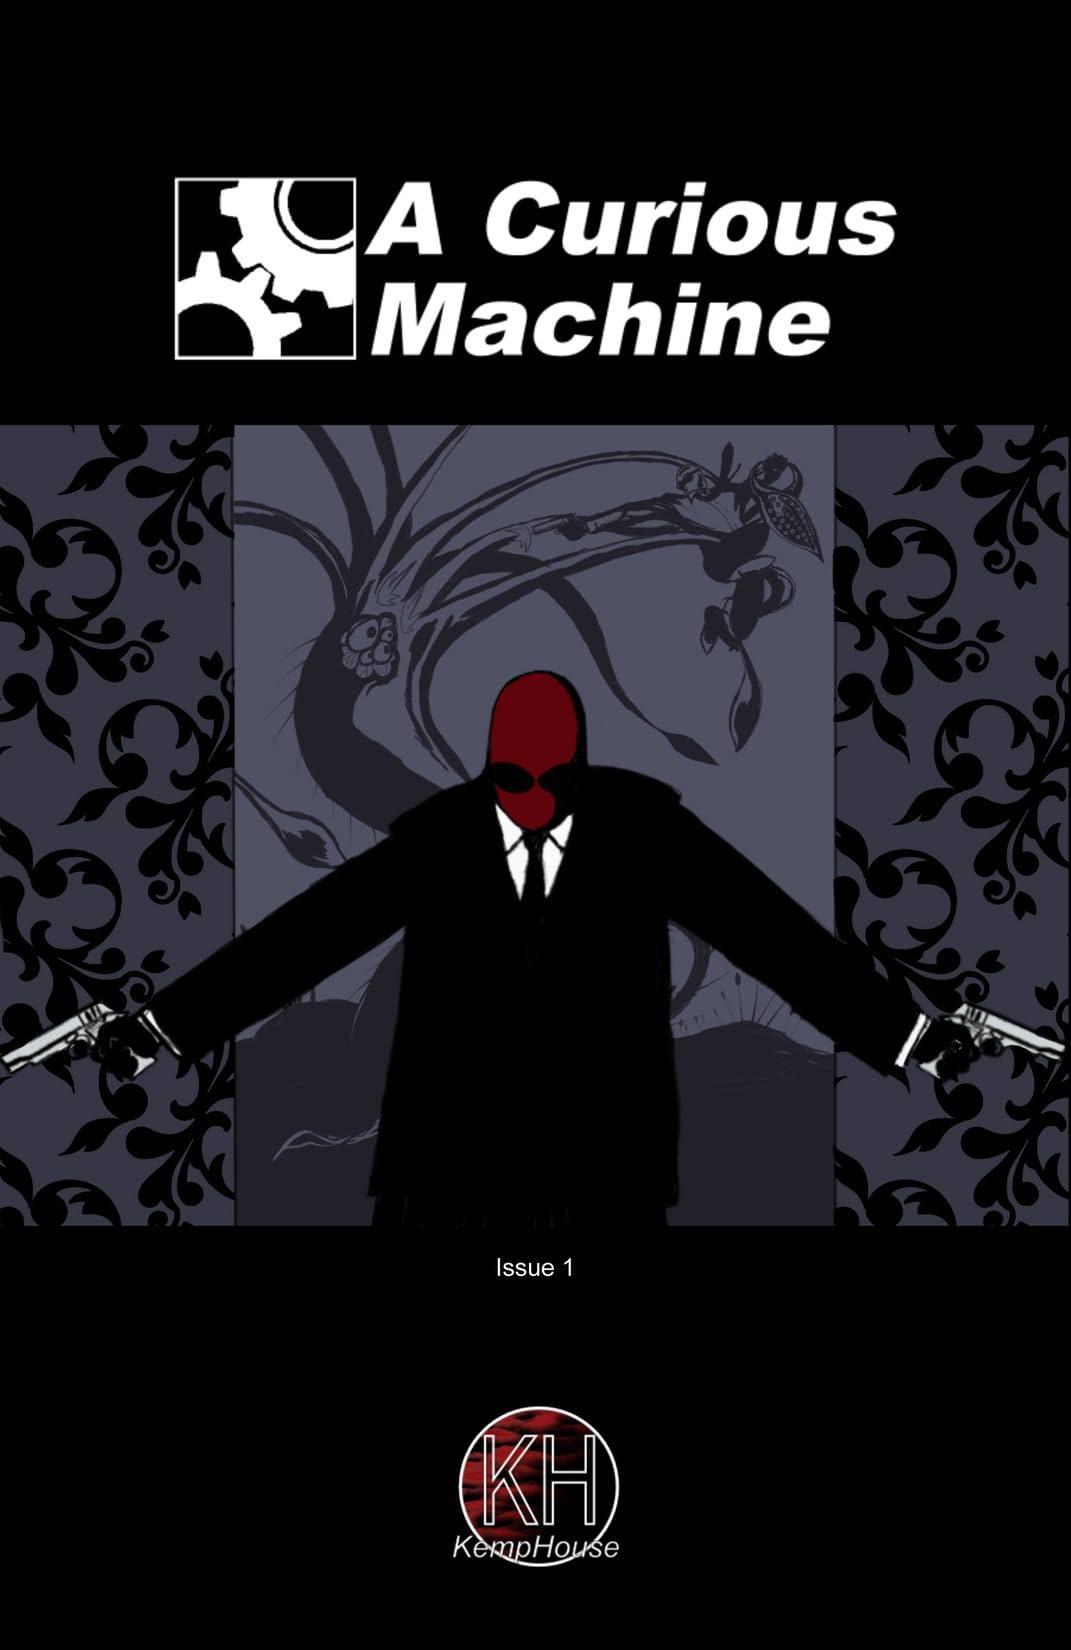 A Curious Machine #1